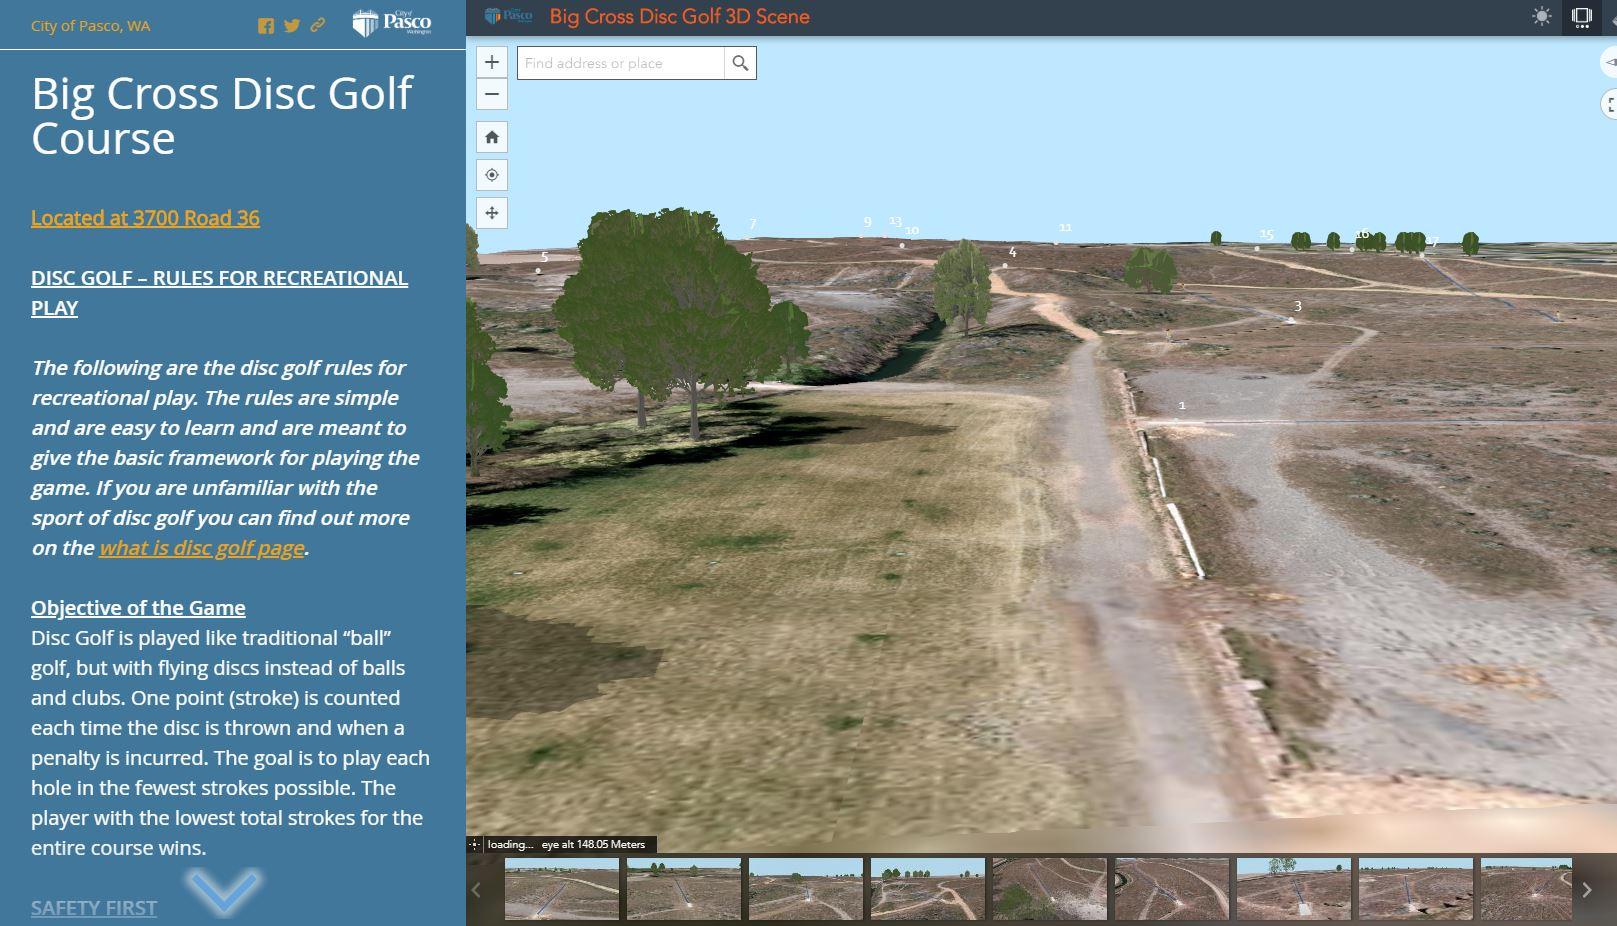 City of Pasco GIS Consortium Project